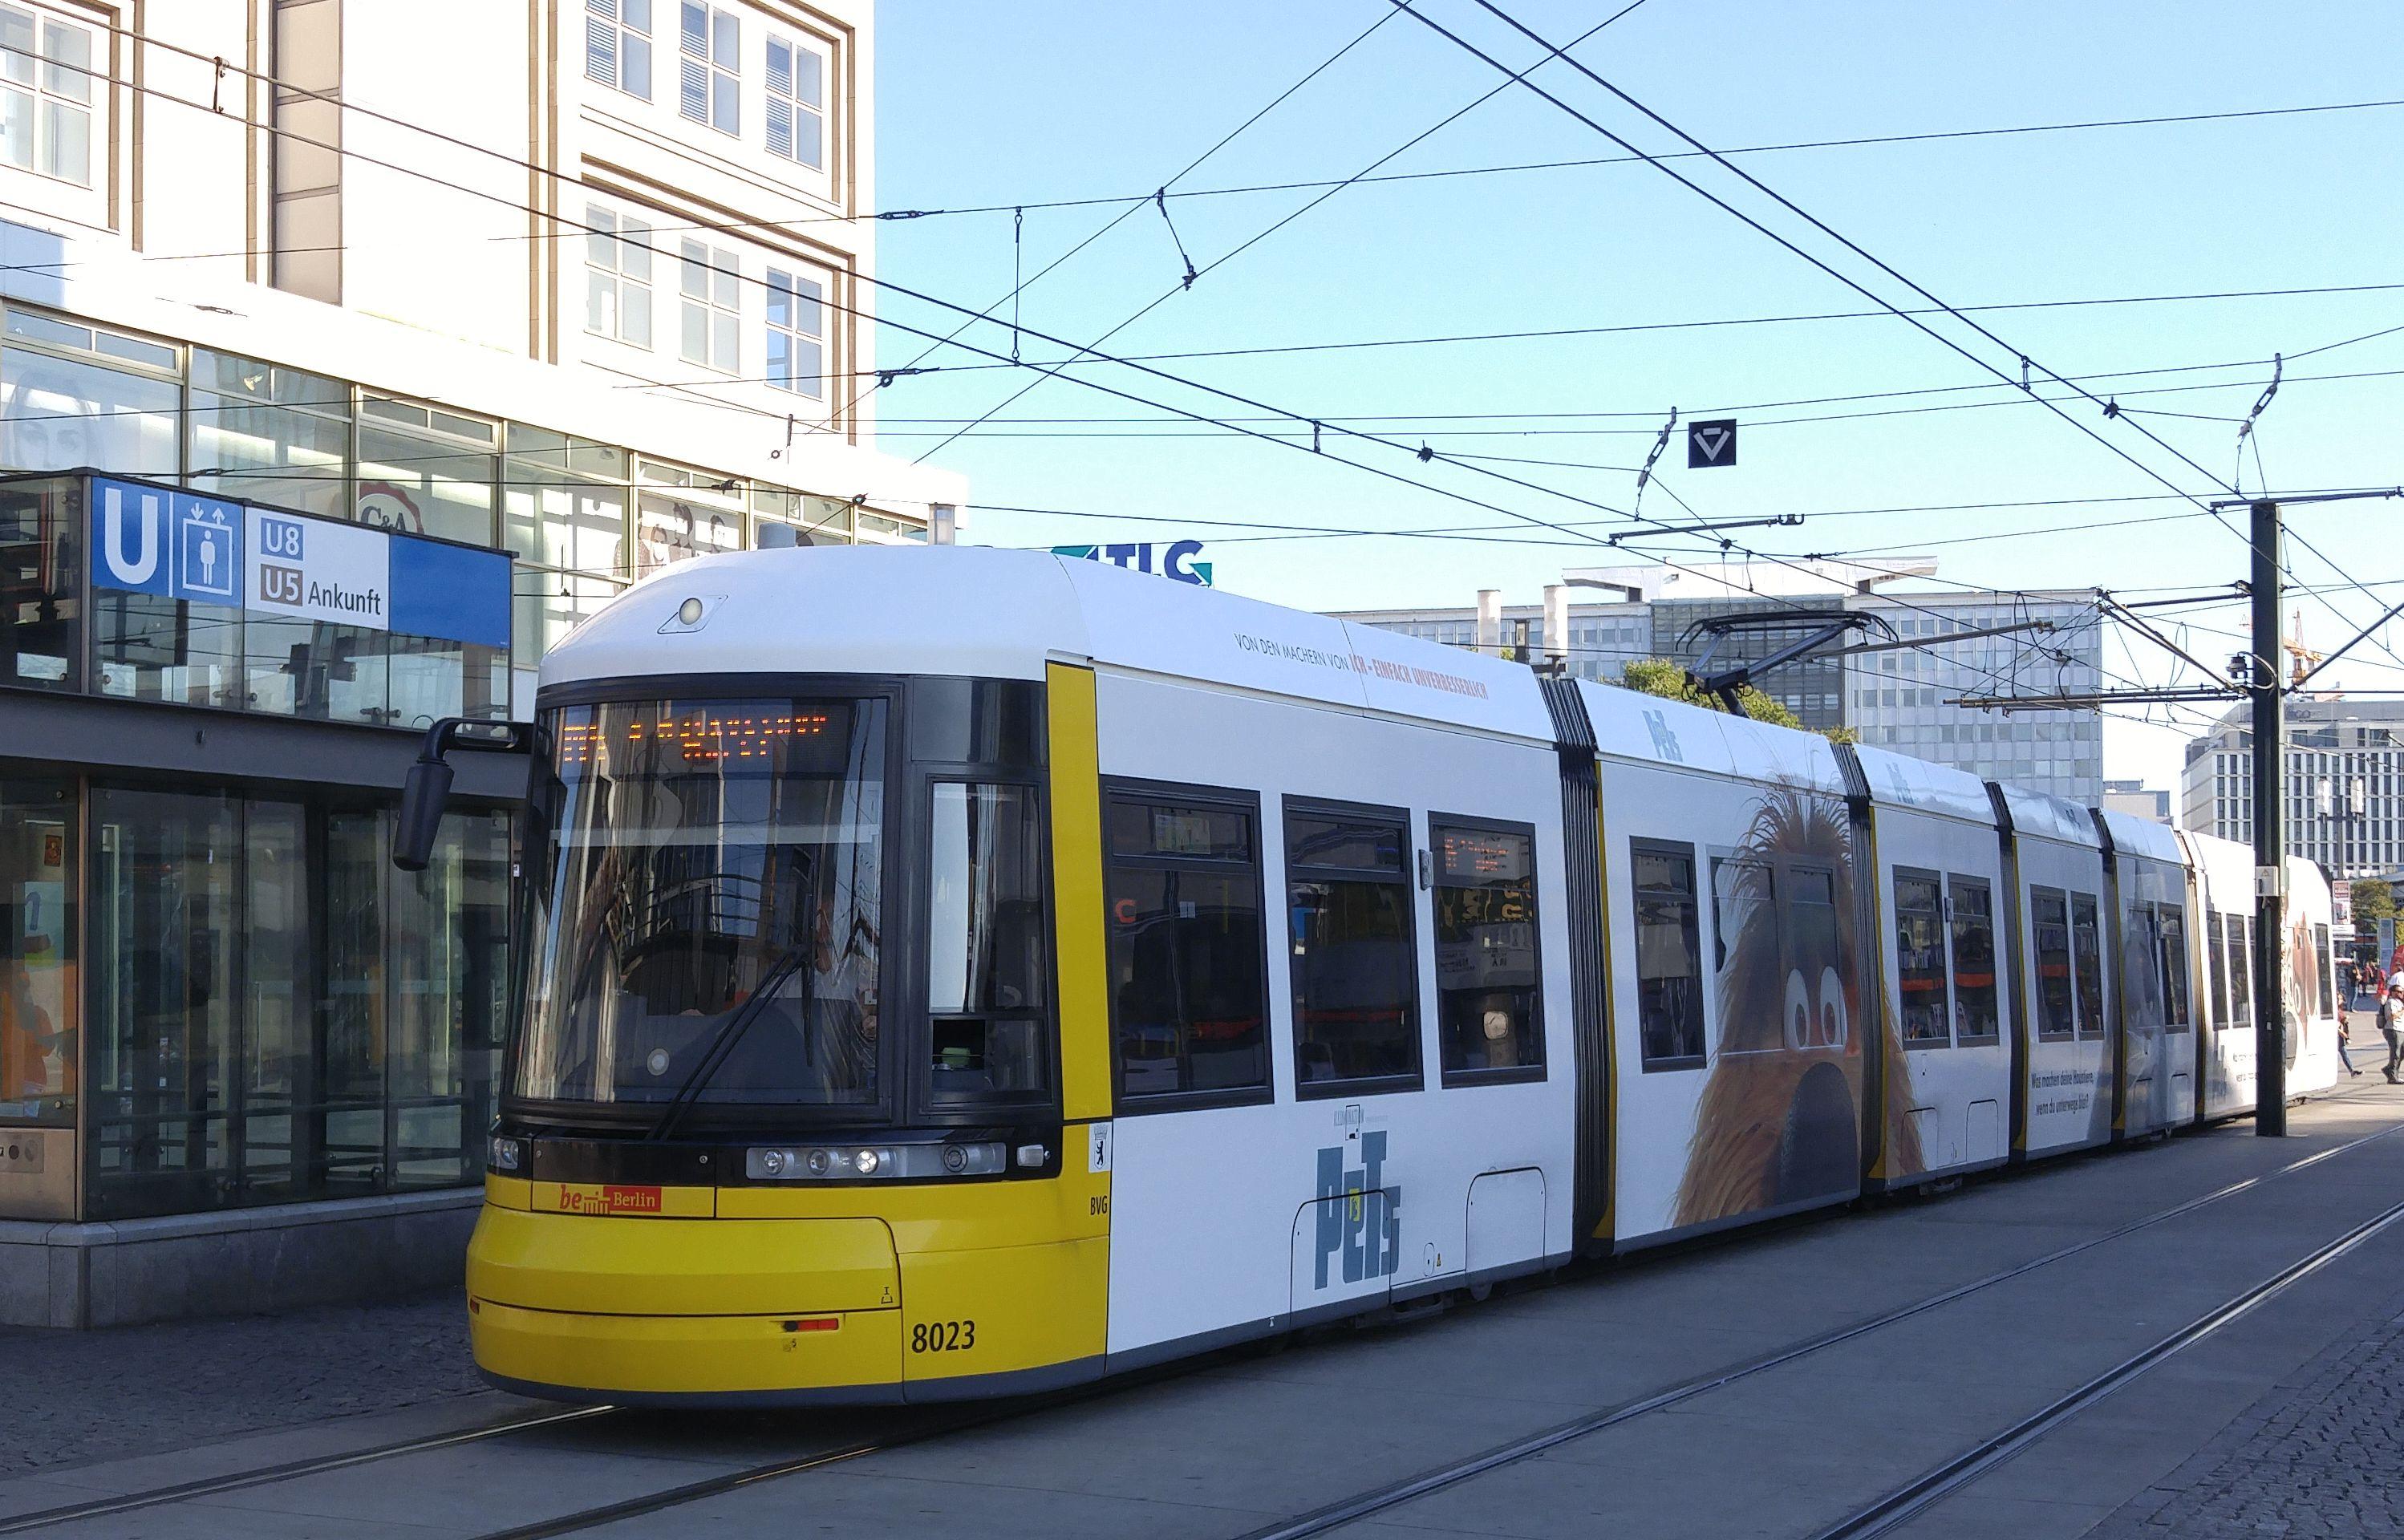 Foto: Straßenbahn 8023, Typ Flexity ERL, Alexanderplatz, 2016